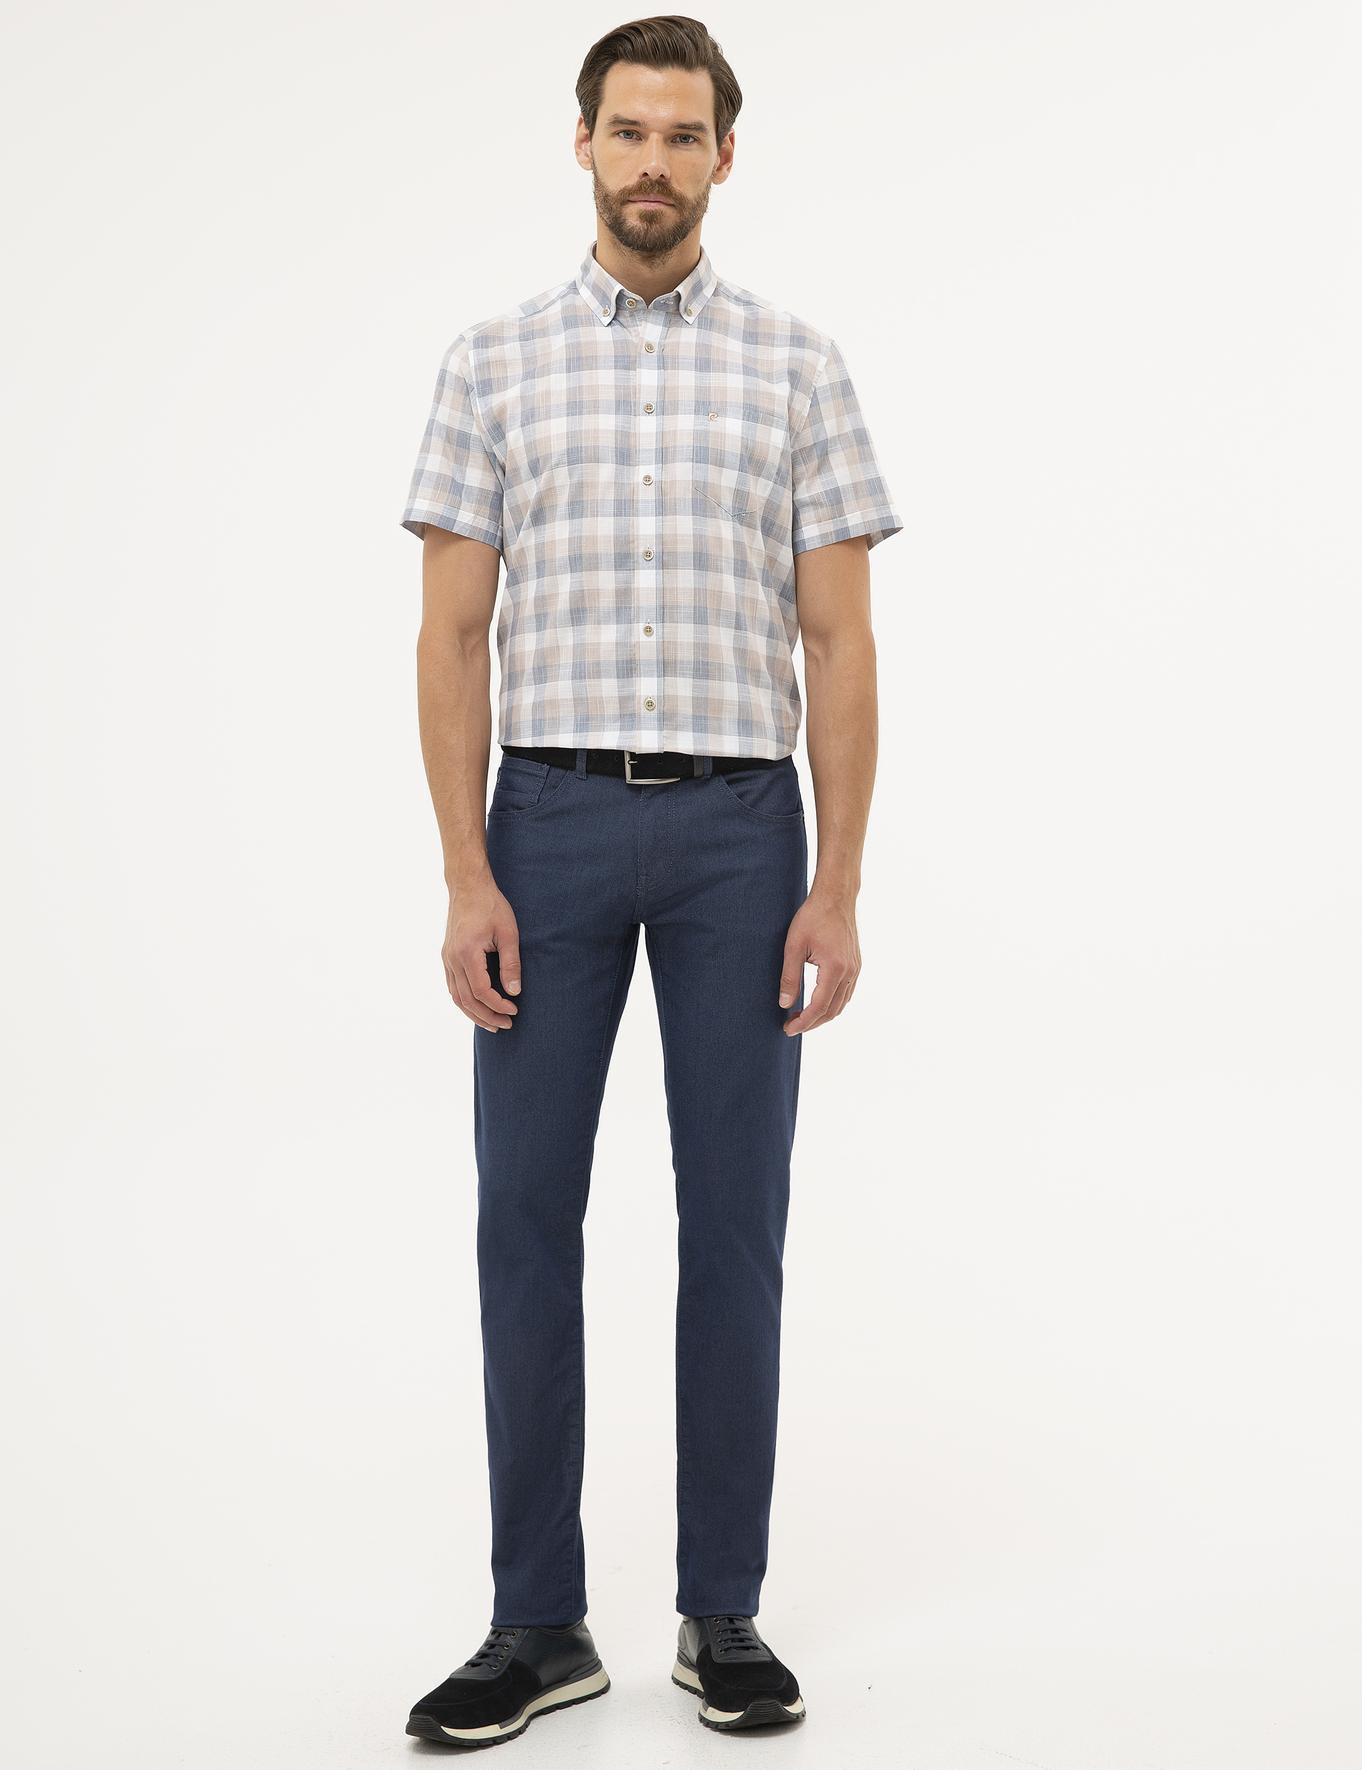 Açık Kahverengi Detaylı Regular Fit Kısa Kollu Gömlek